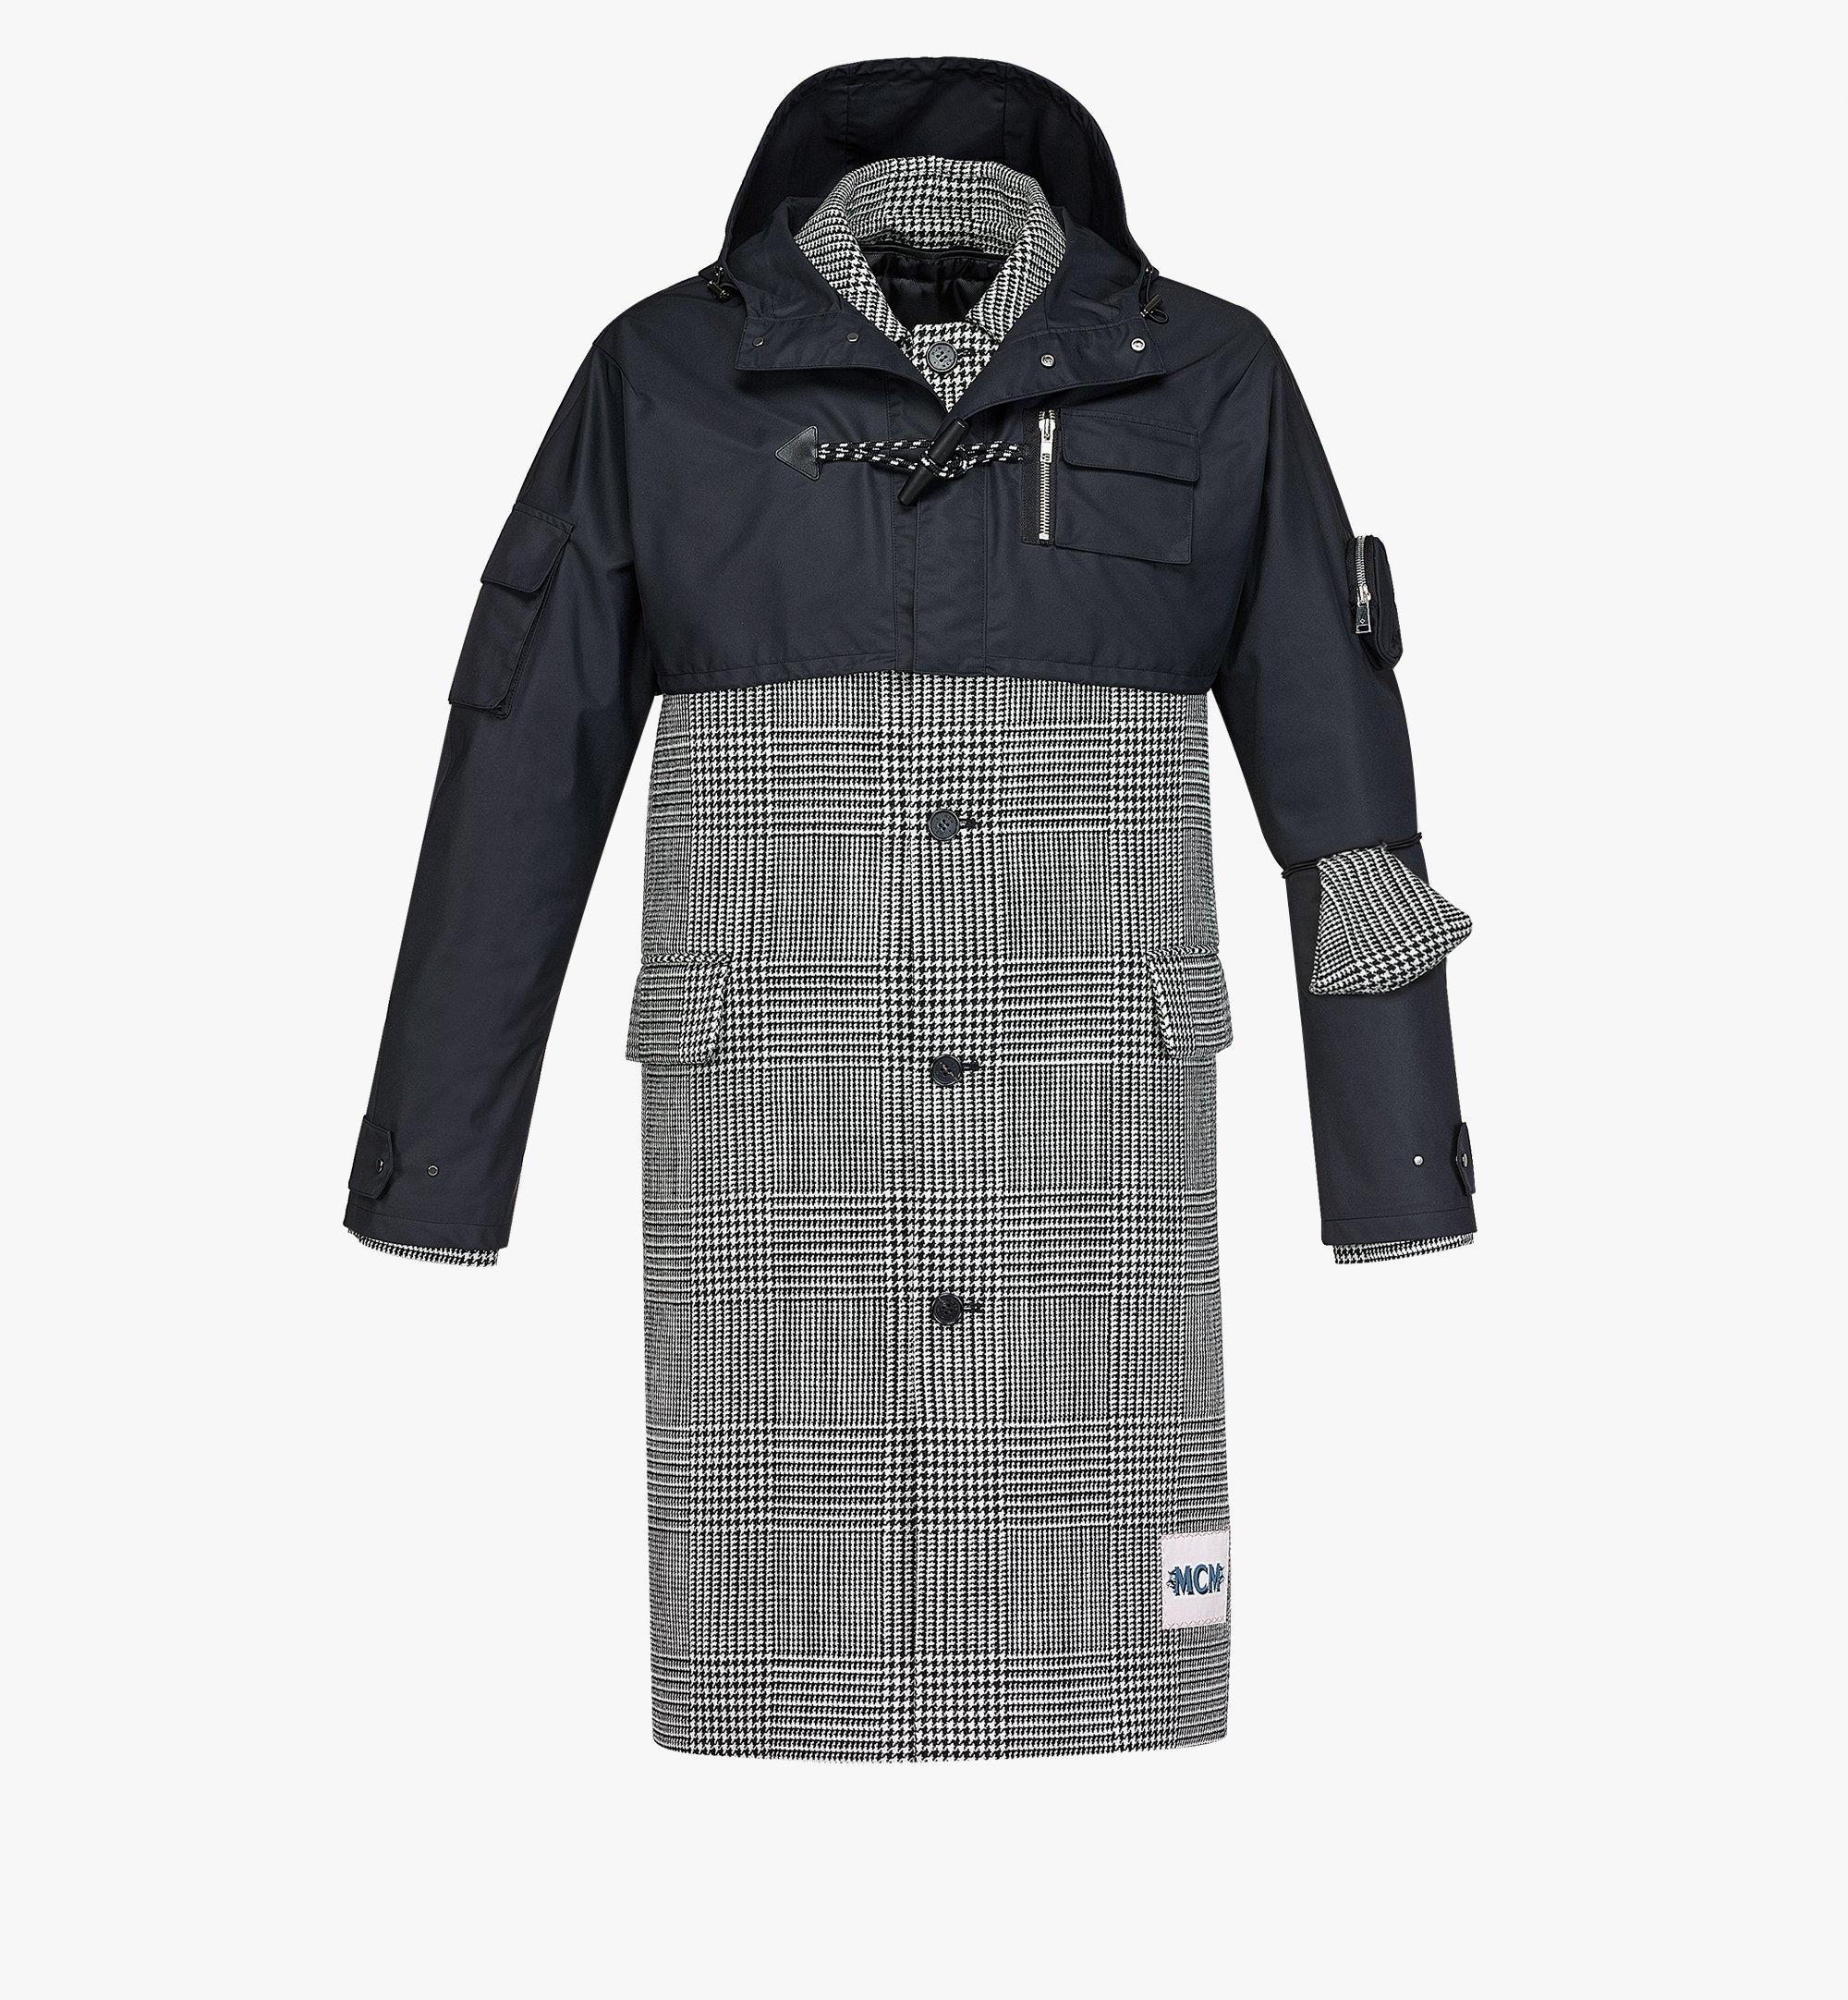 MCM Men's Check Wool Coat with Nylon Overlay Black MHCBAMM01BK046 Alternate View 1